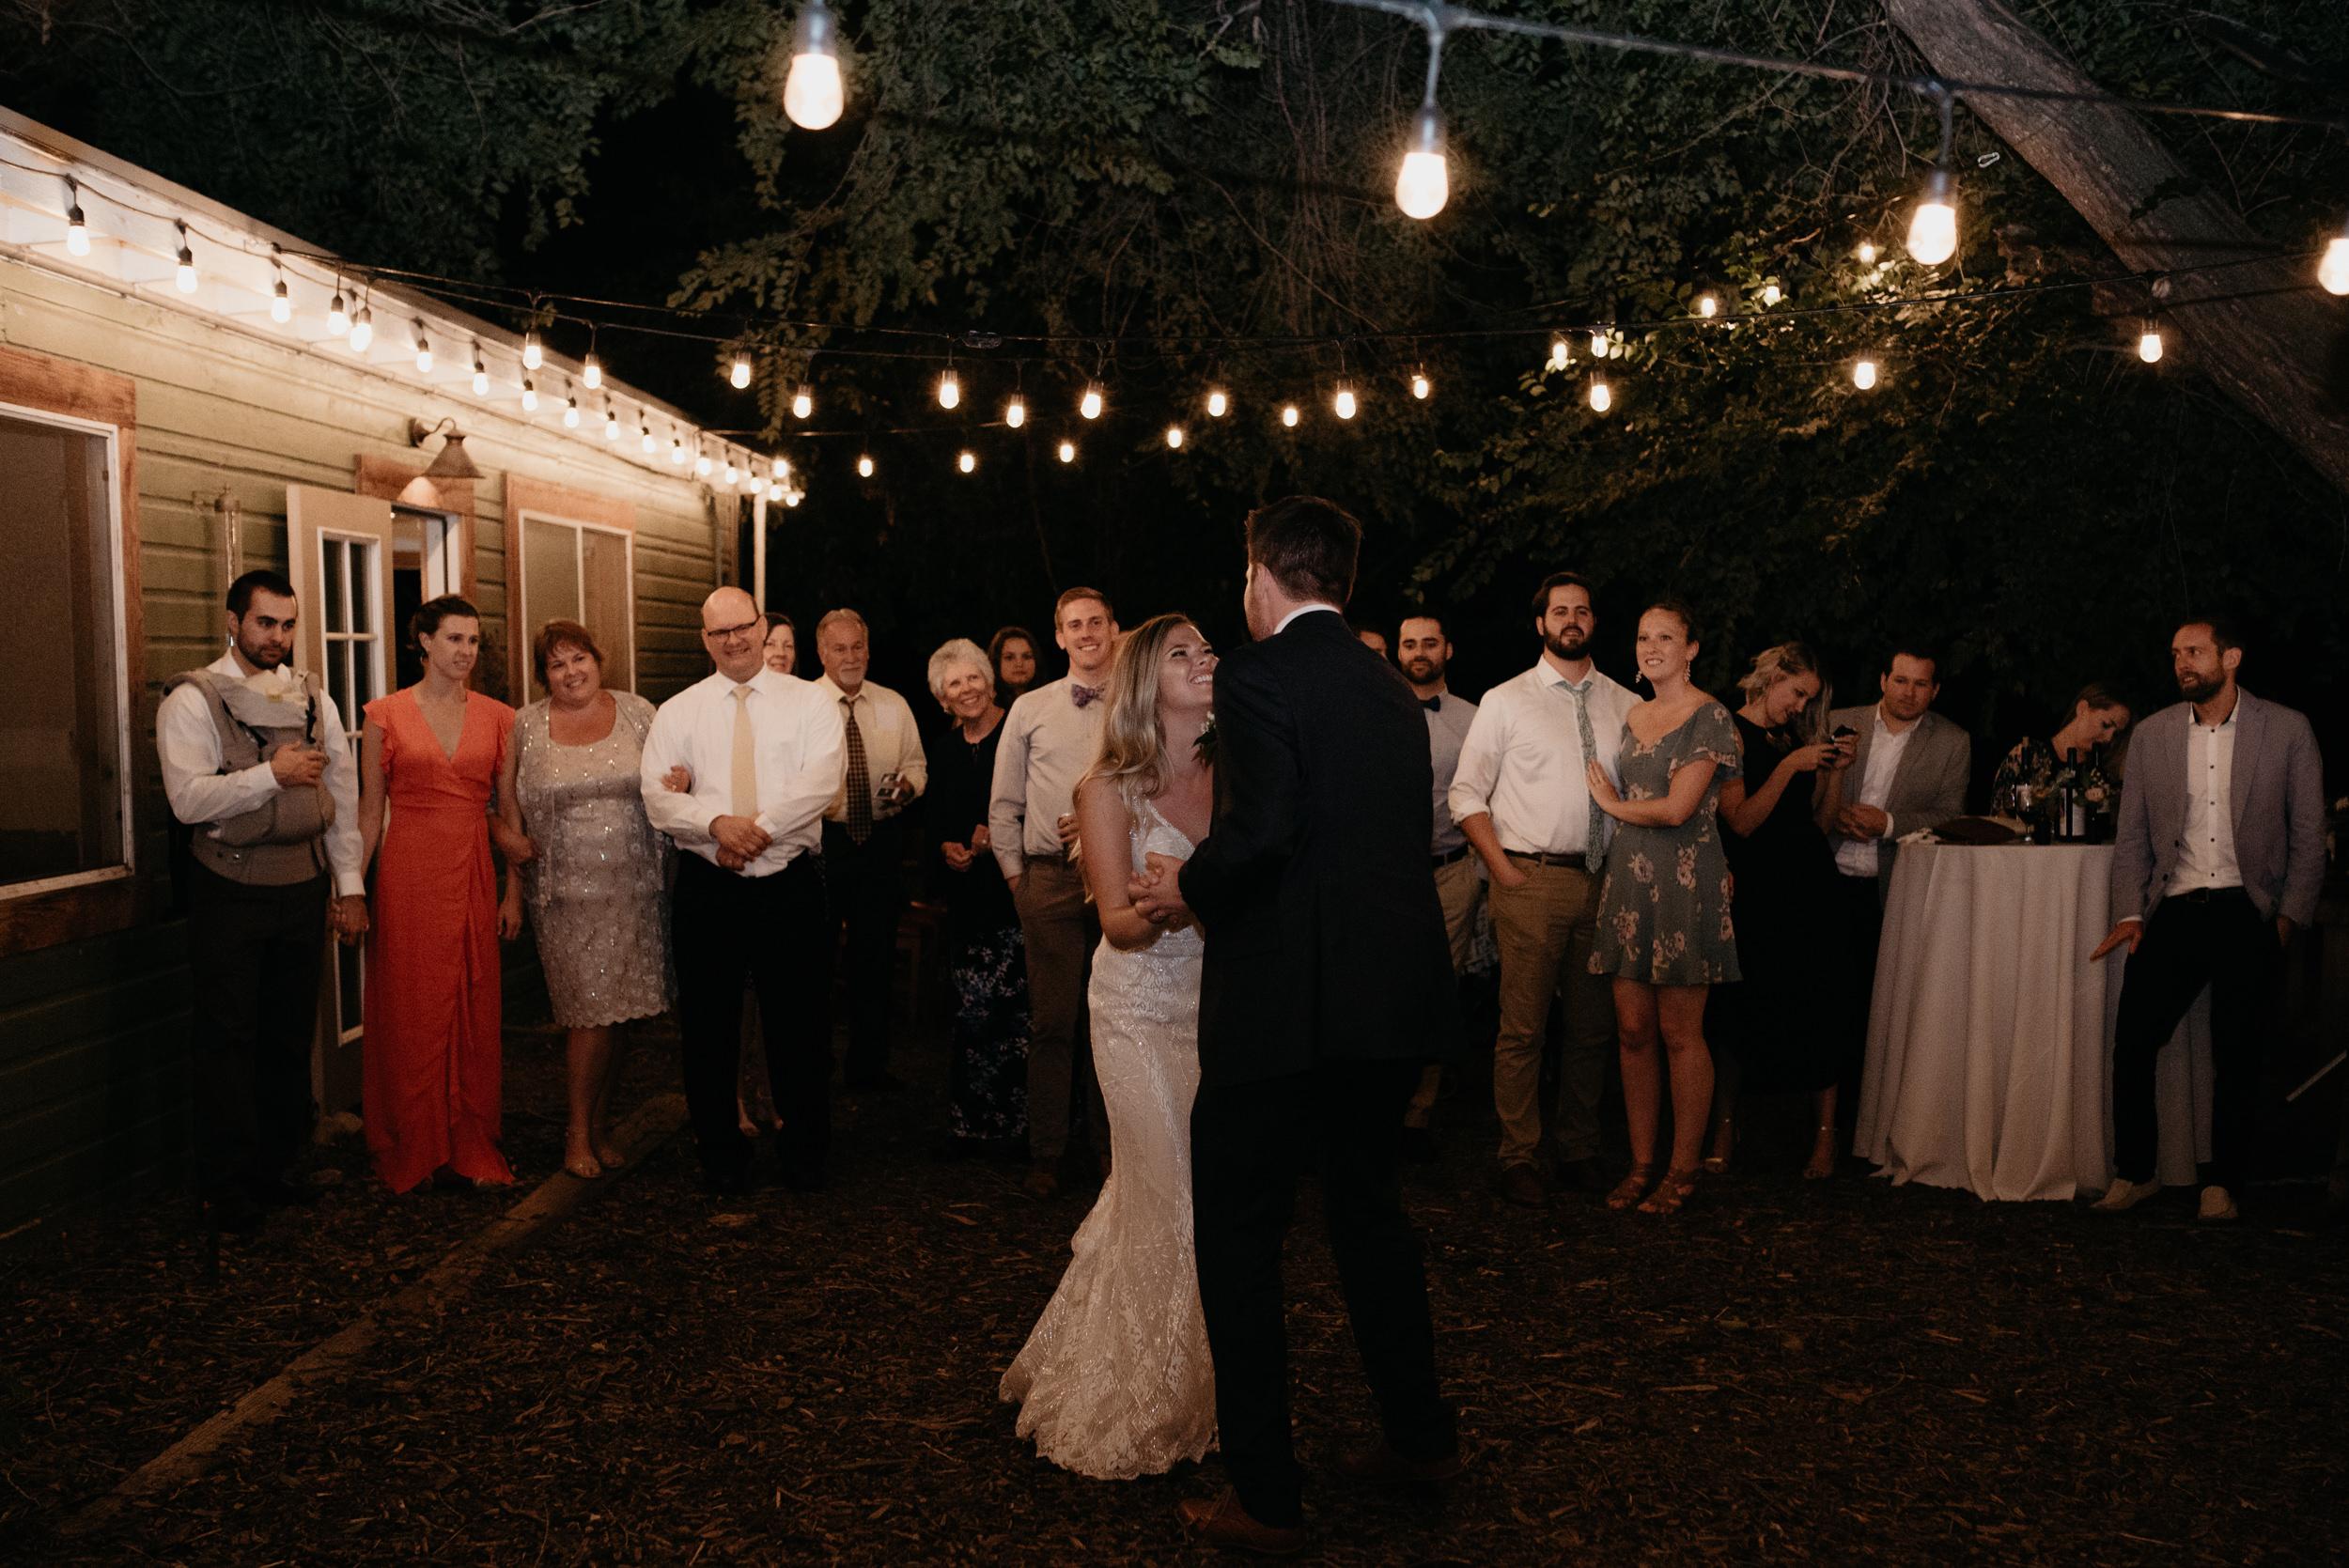 Breckenridge, Colorado adventure wedding and elopement photographer.